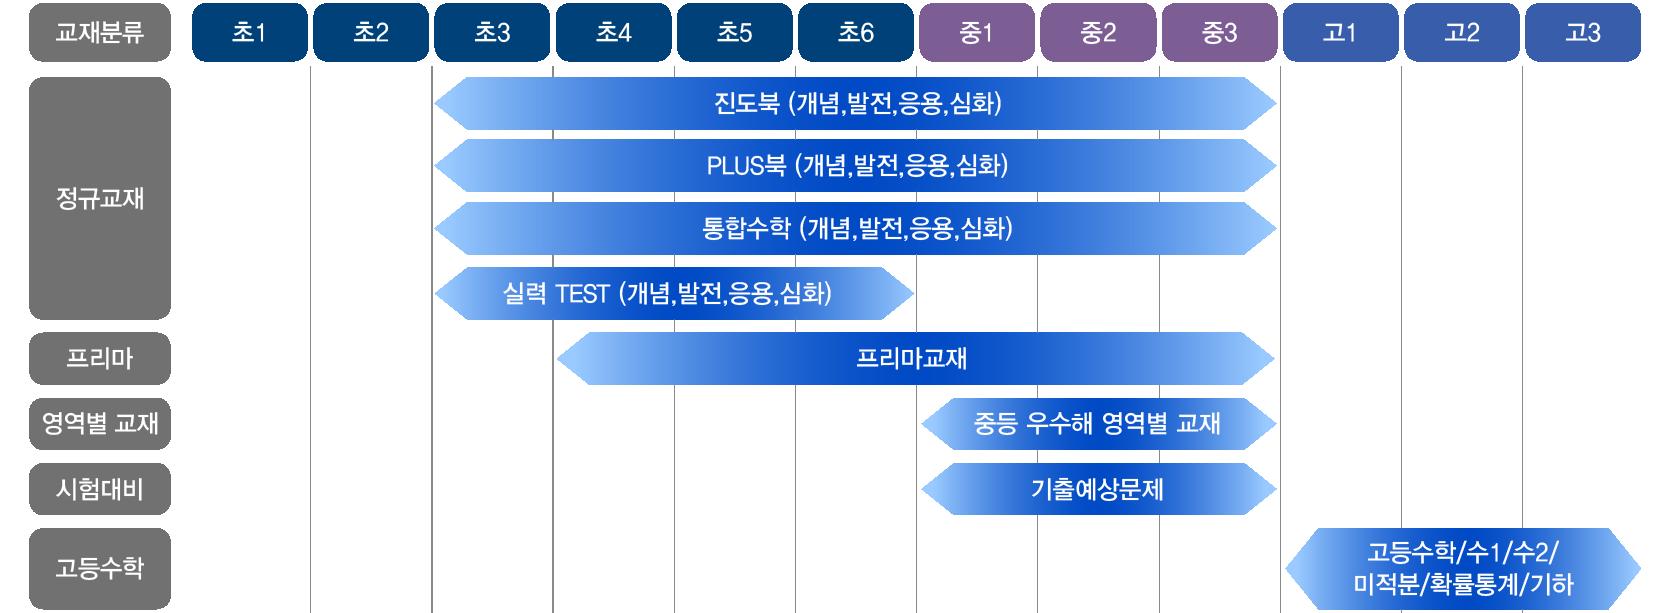 NS_M_Lineup_03